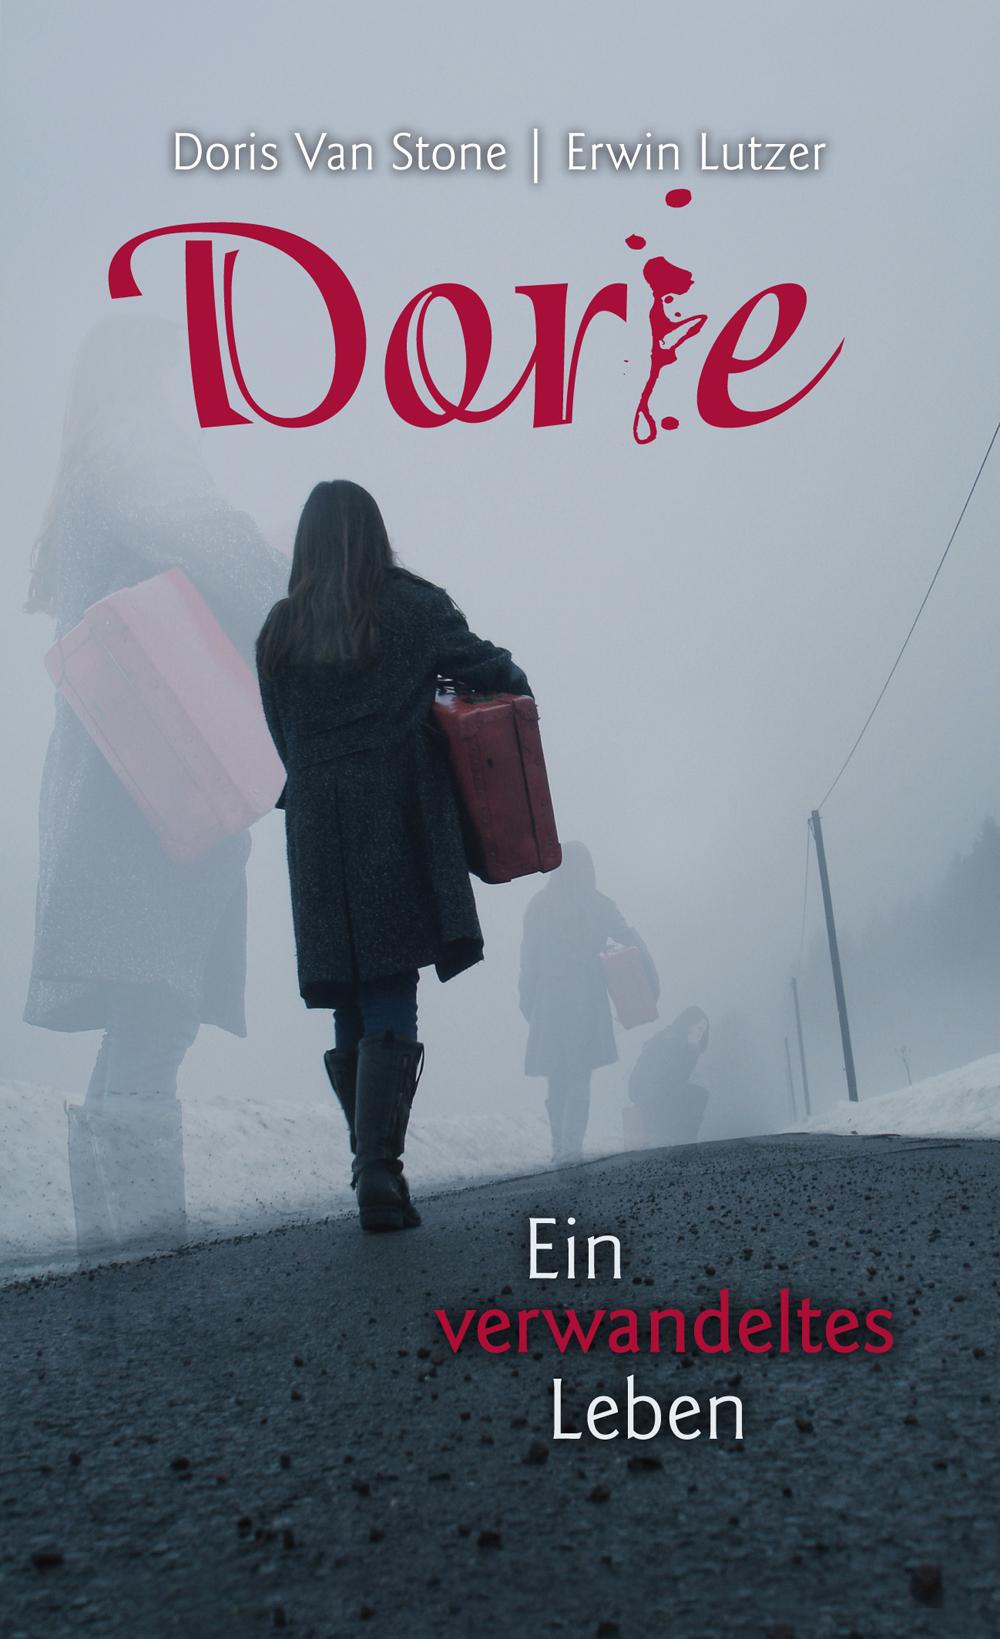 CLV_dorie_doris-van-stone-erwin-w-lutzer_256138_1